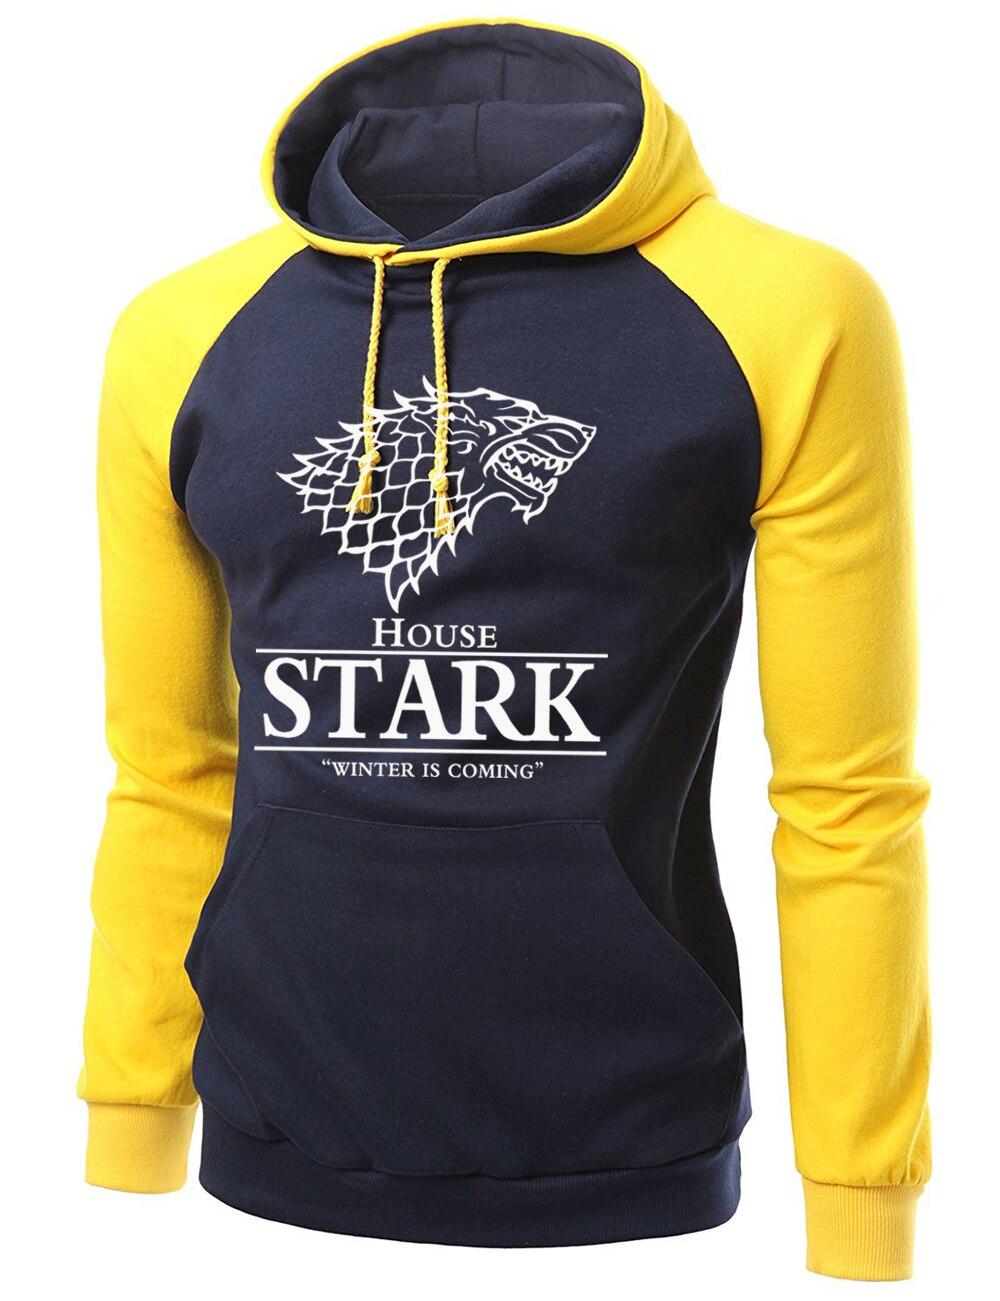 2019 Frühling Herbst Fleece Männer Sweatshirts Game Of Thrones Haus Stark Raglan Hoodies Männer Hip Hop Streetwear Marke Kleidung